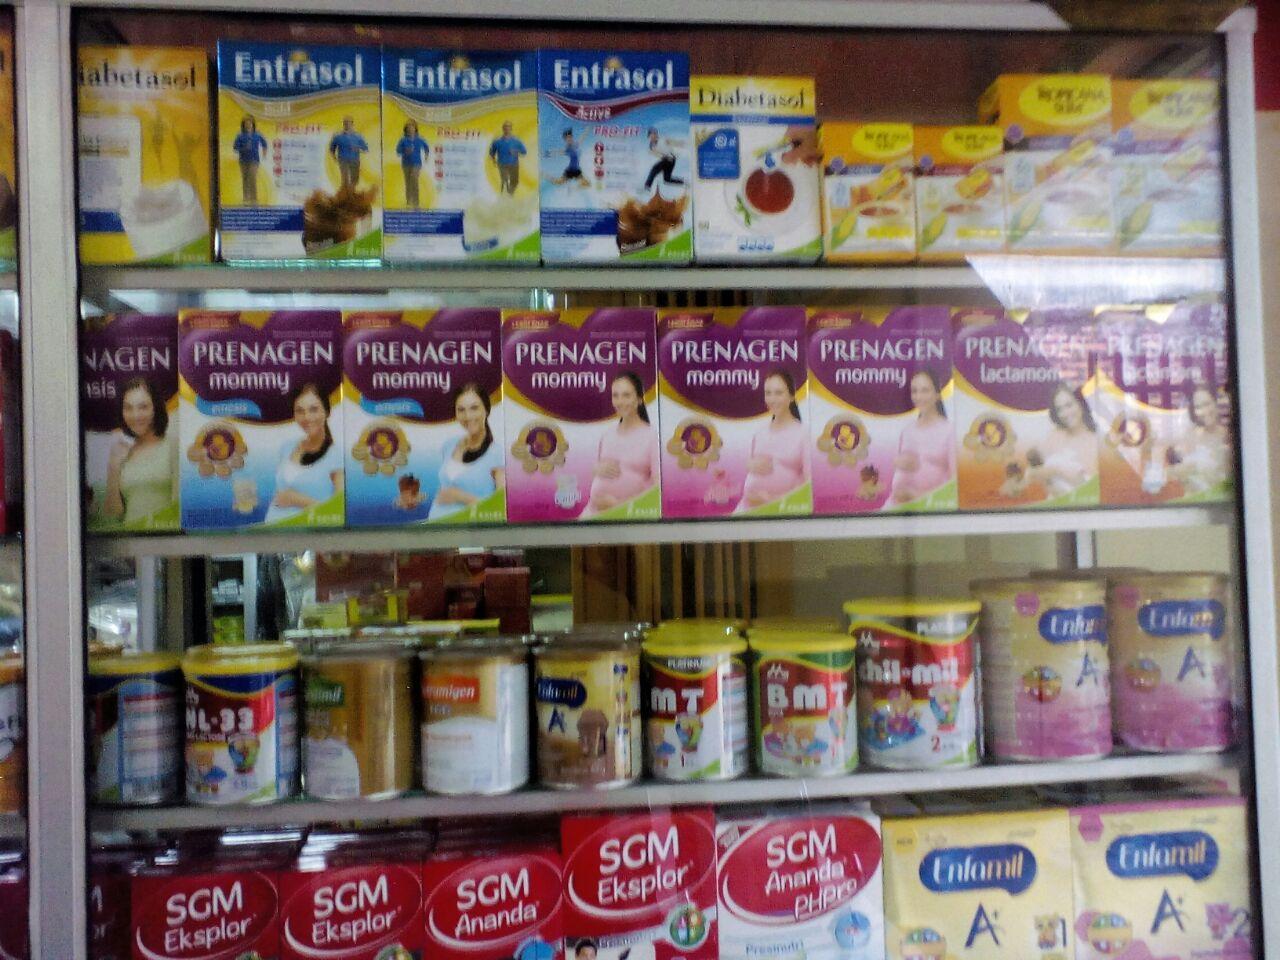 5 Merk Susu Ibu Hamil Muda Trimester Pertama Susu Hamil